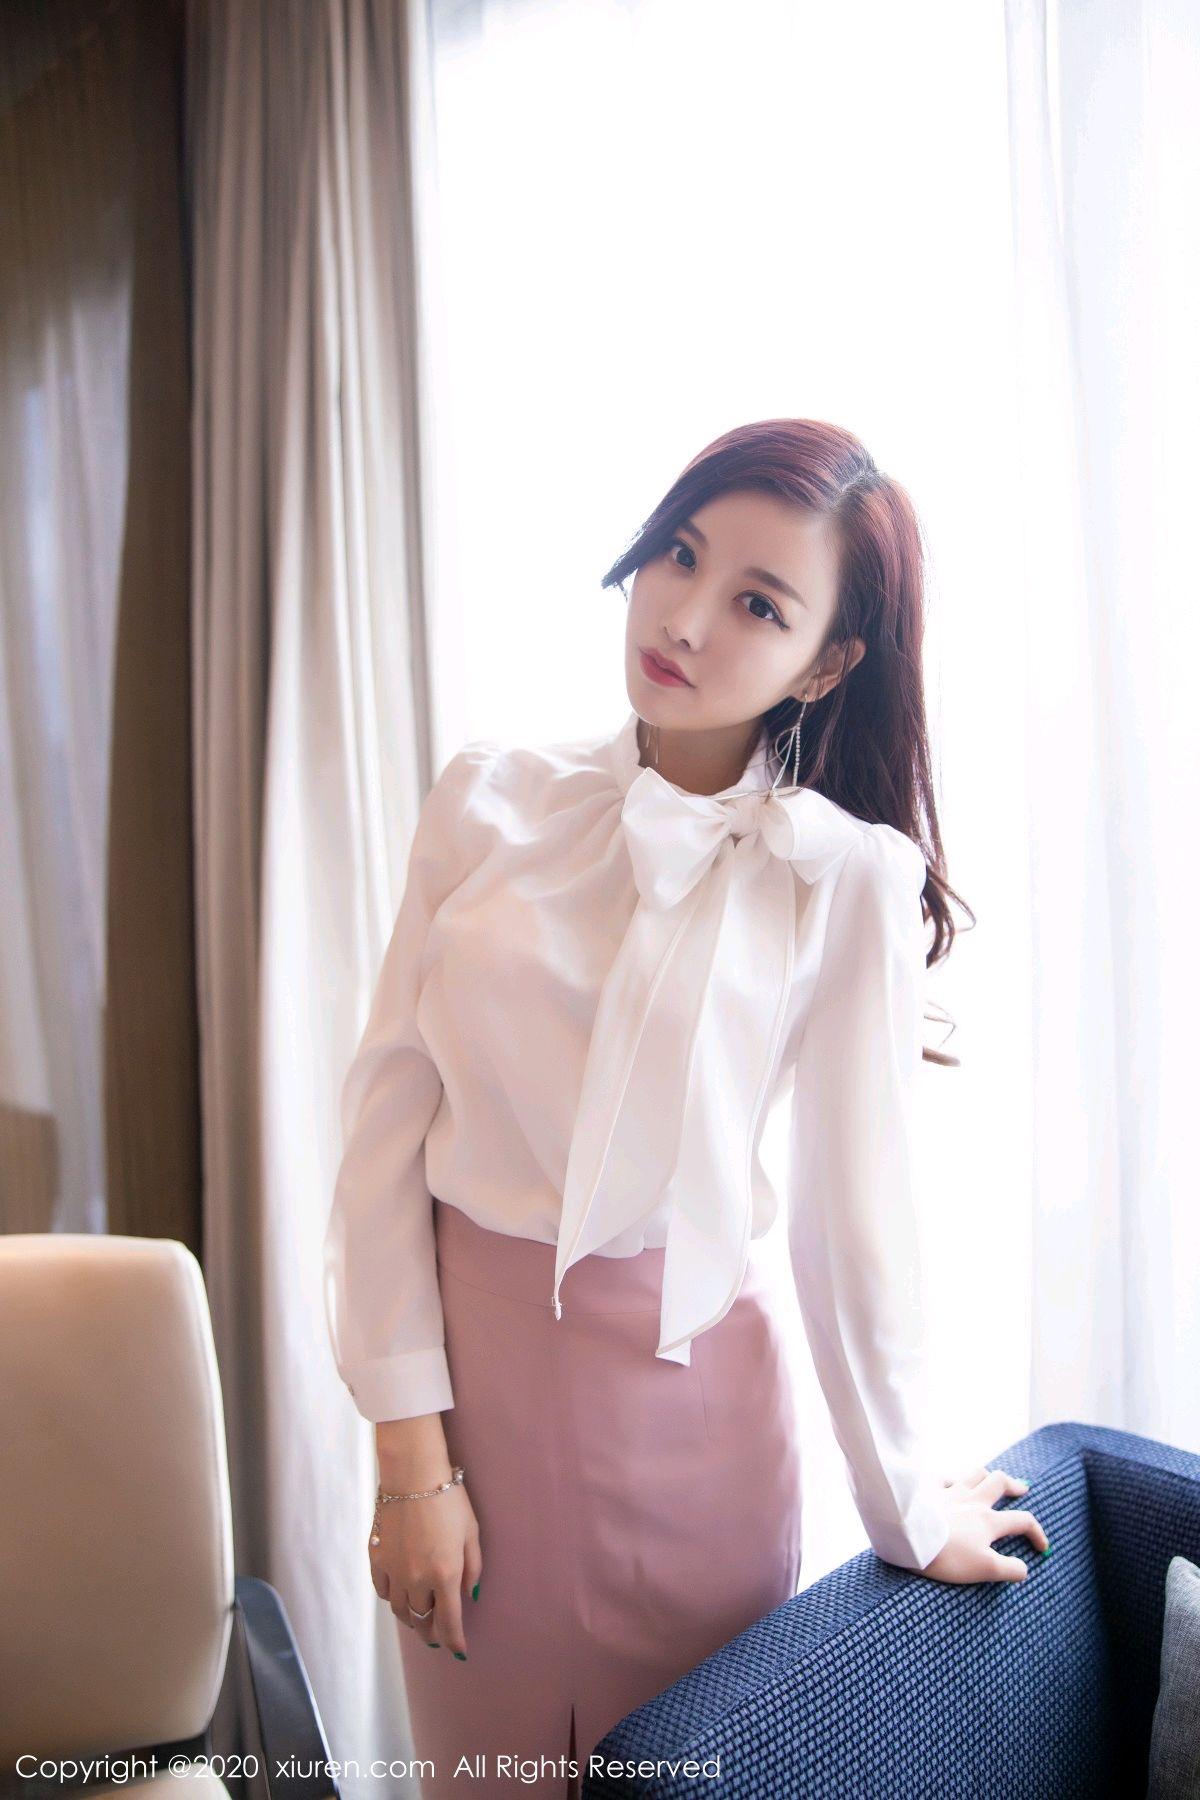 [XiuRen] Vol.2431 Yang Chen Chen 45P, Tall, Underwear, Uniform, Xiuren, Yang Chen Chen